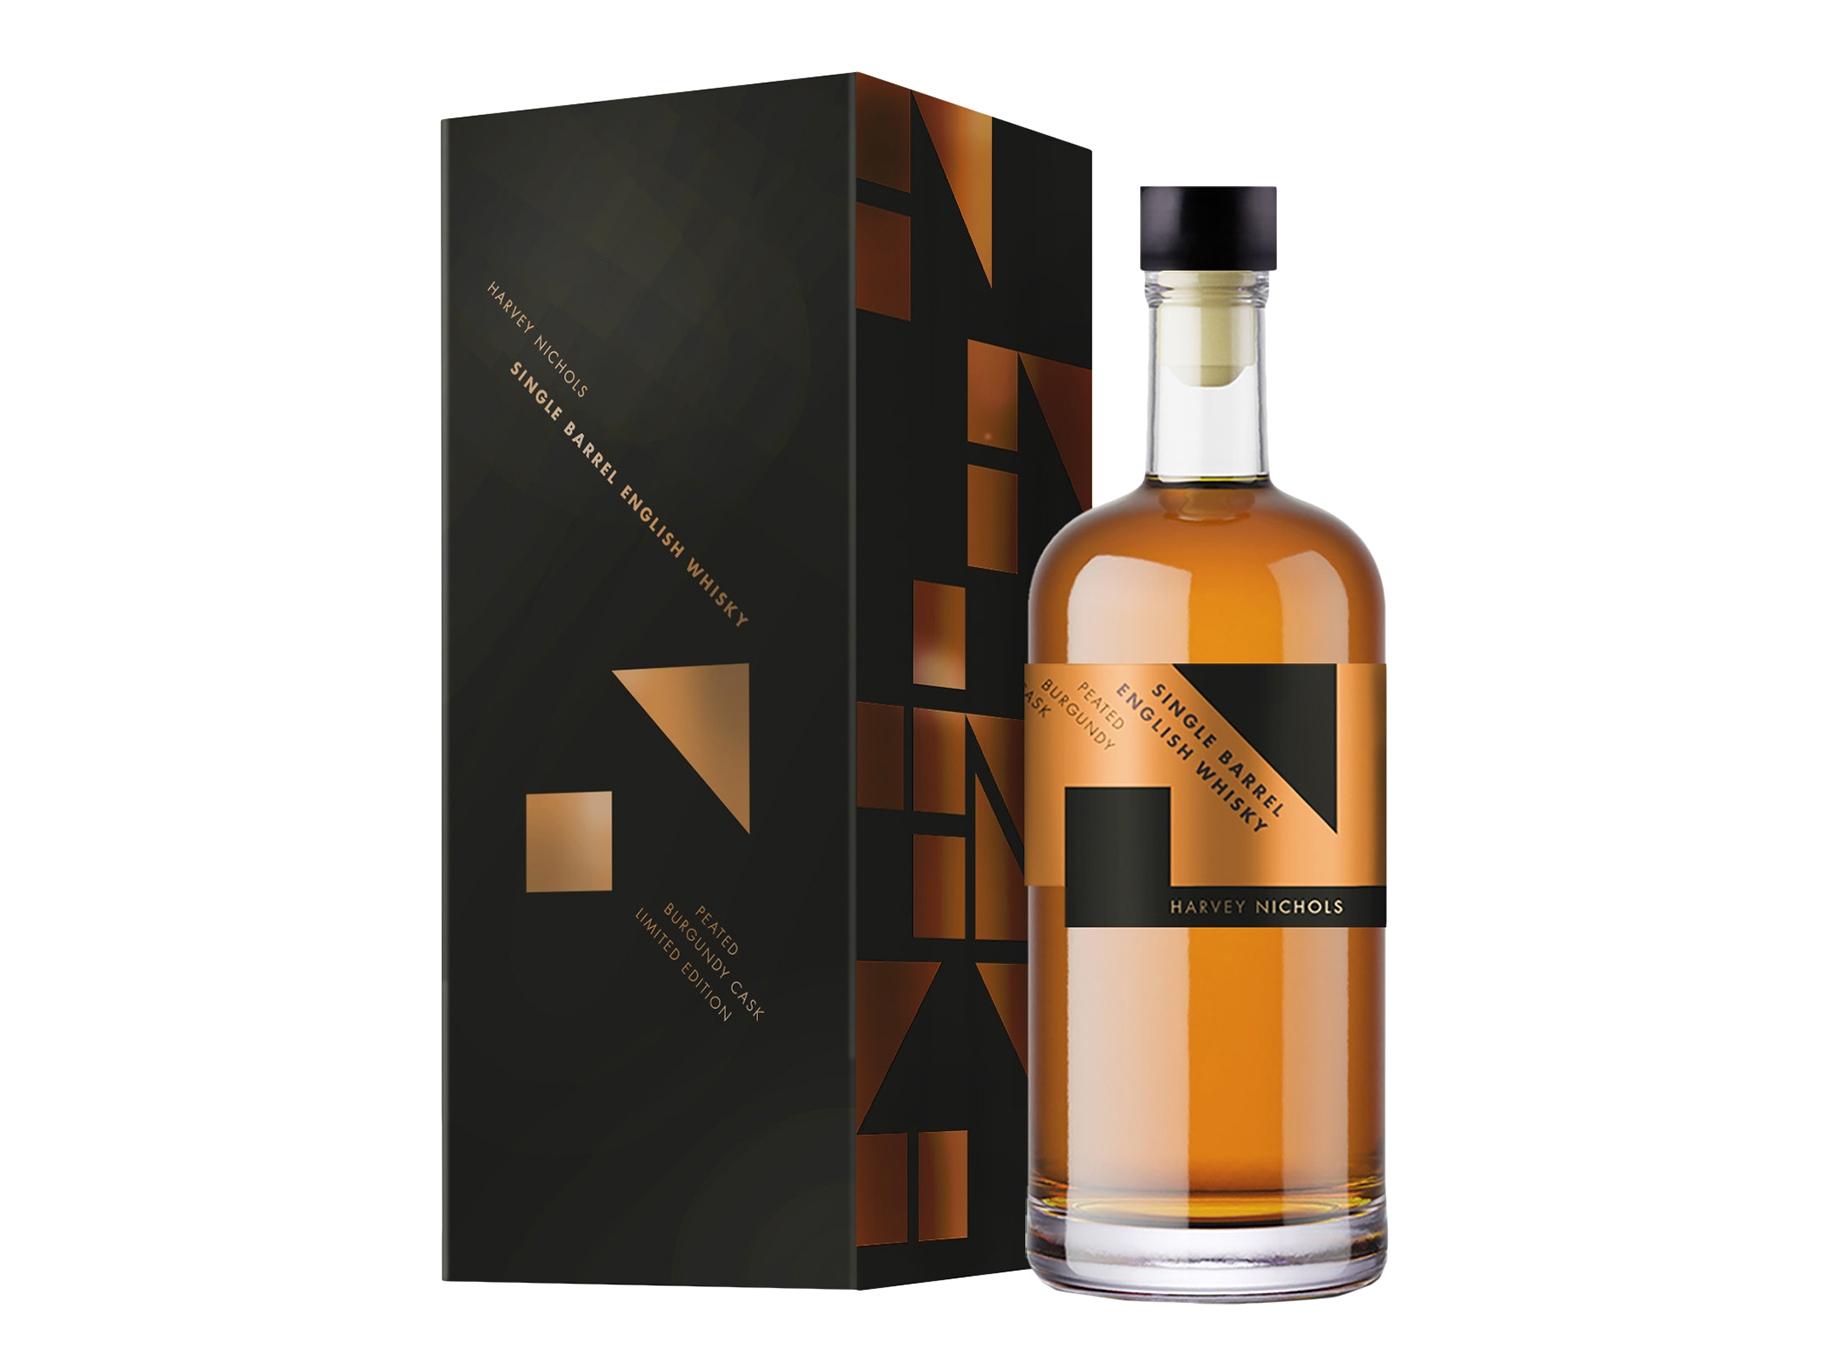 Harvey Nichols Peated Burgundy Cask Single Barrel English Whisky